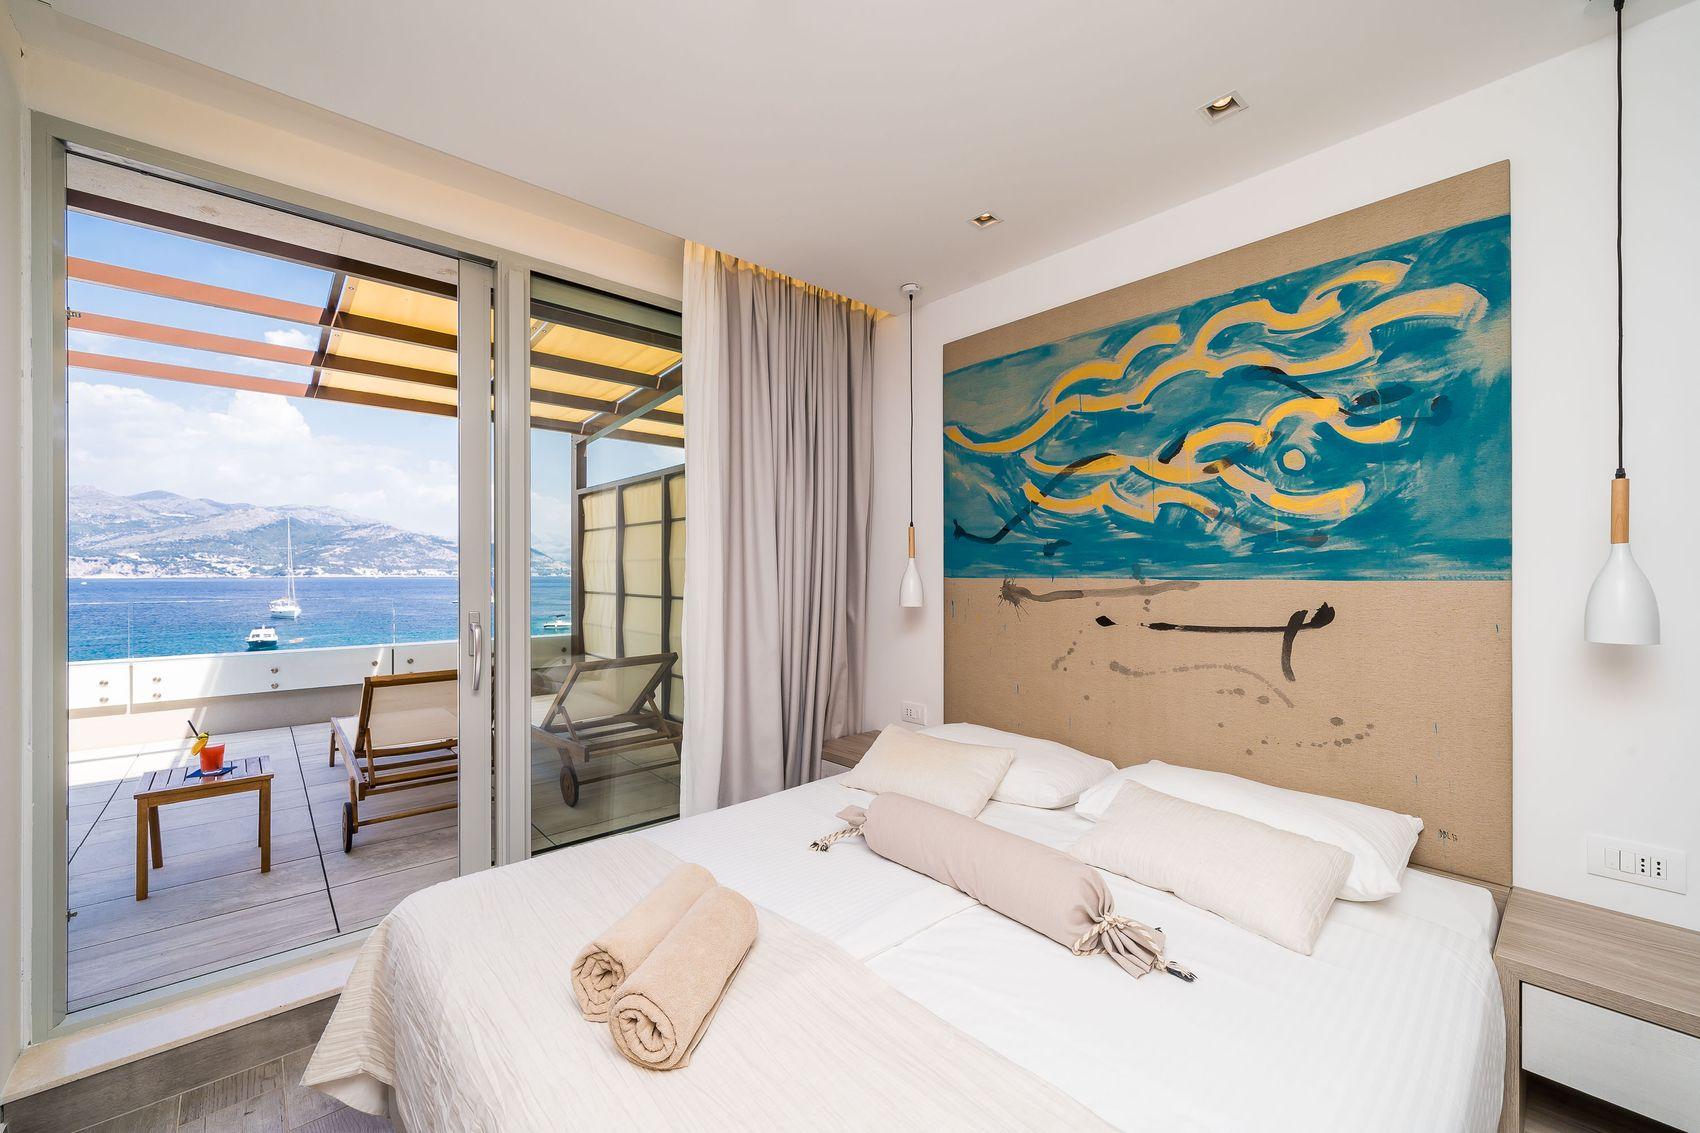 Kalamota 2 Bedroom Suite Premium with terrace